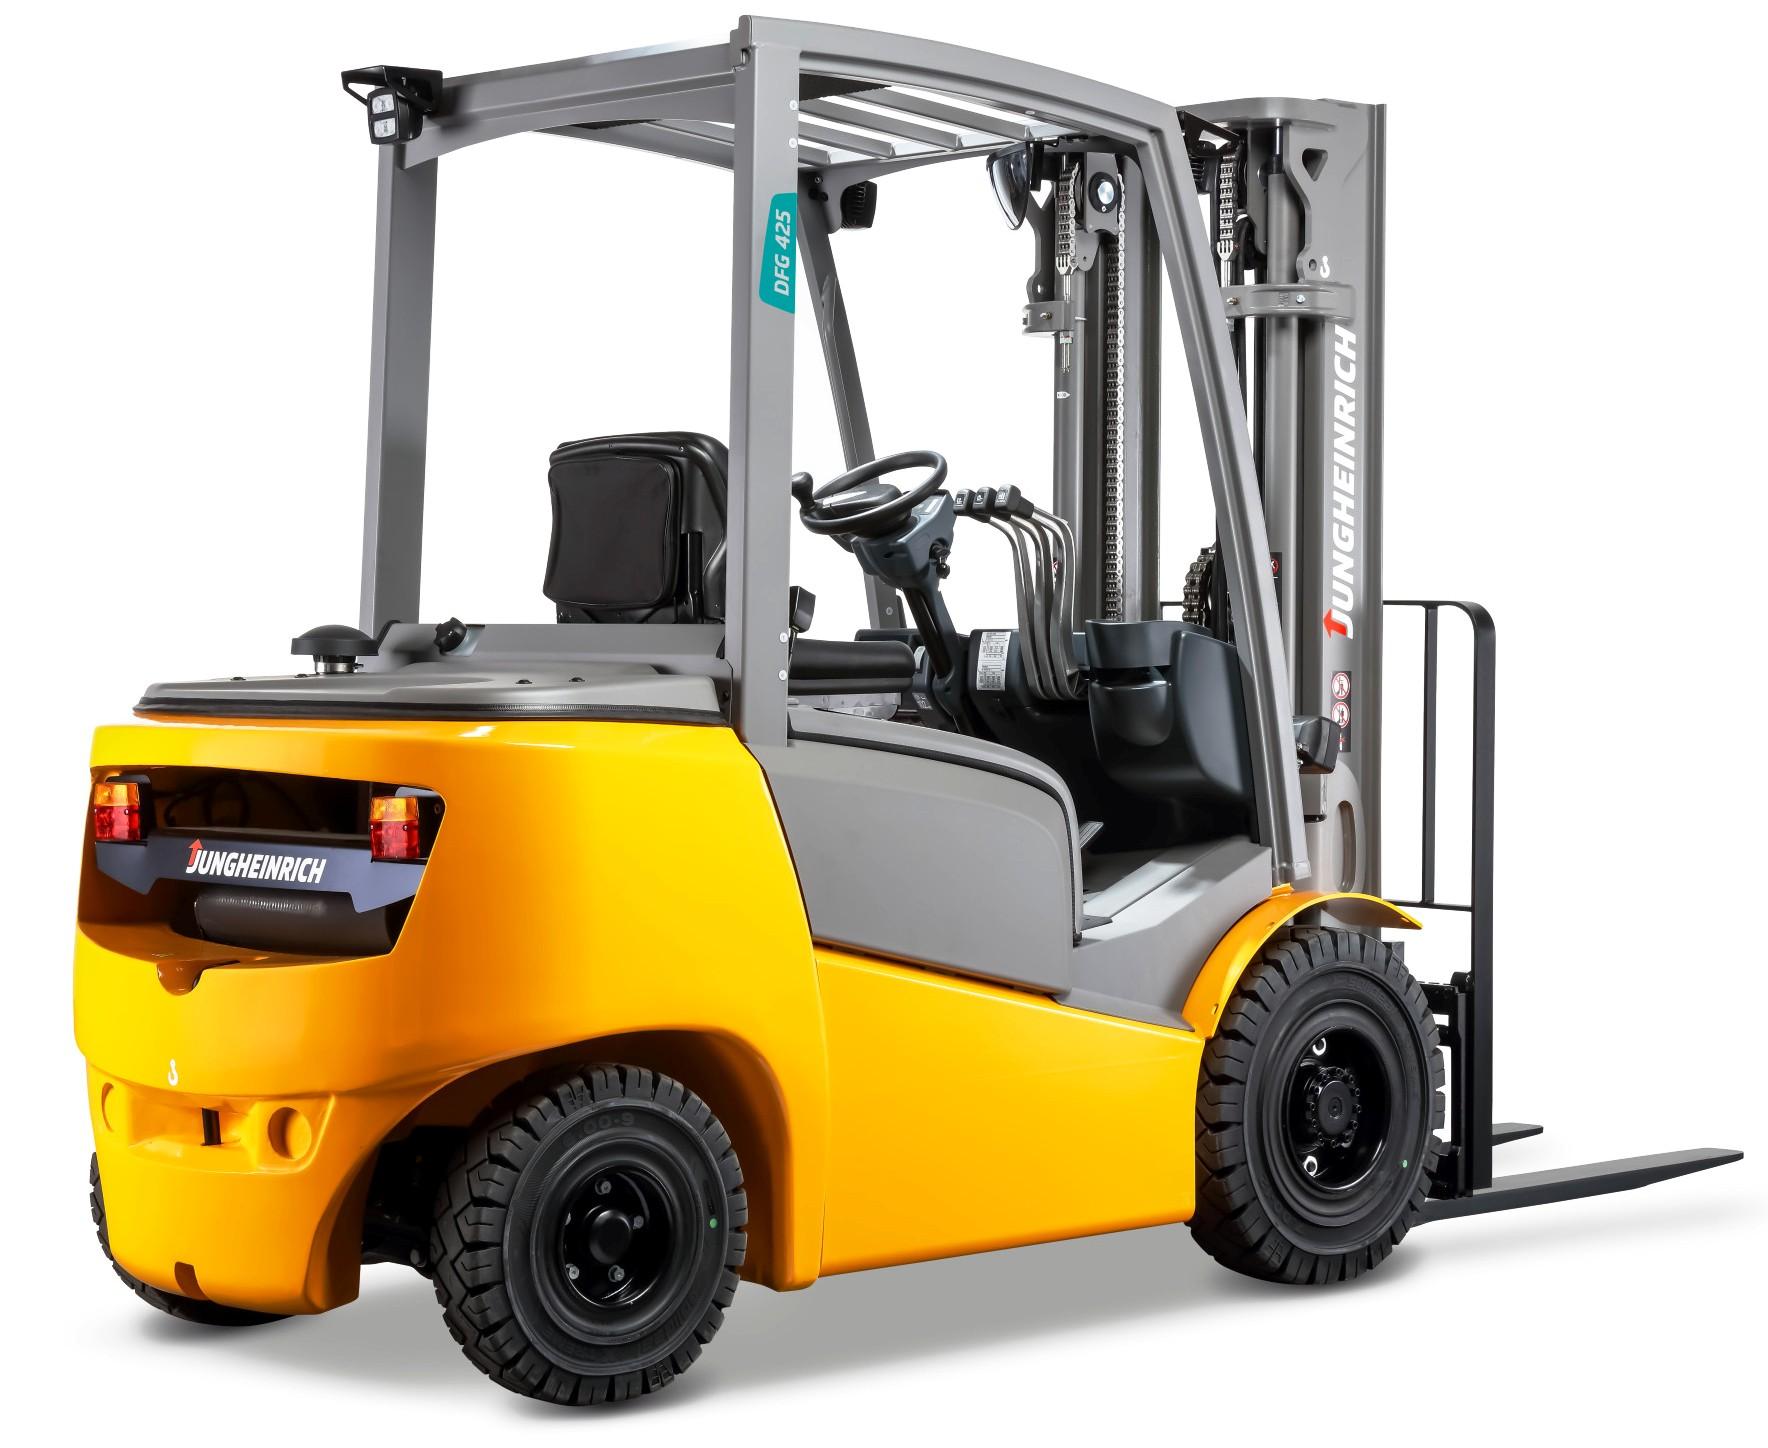 carrelli diesel jungheinrich 25 quintali nuovo usato pellegrino busca